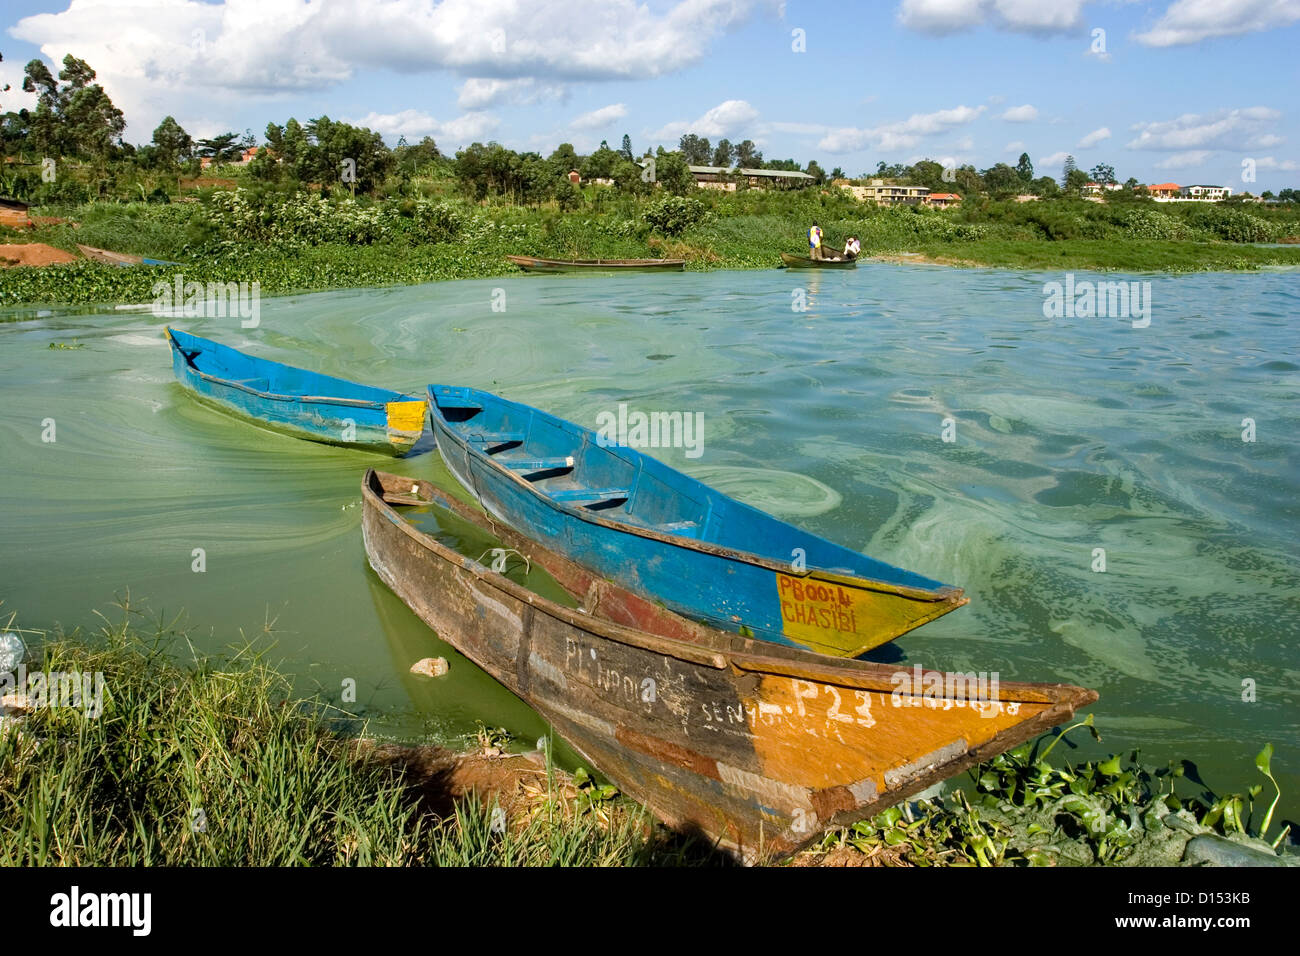 Lake Victoria Fishing Uganda Stock Photos & Lake Victoria Fishing ...